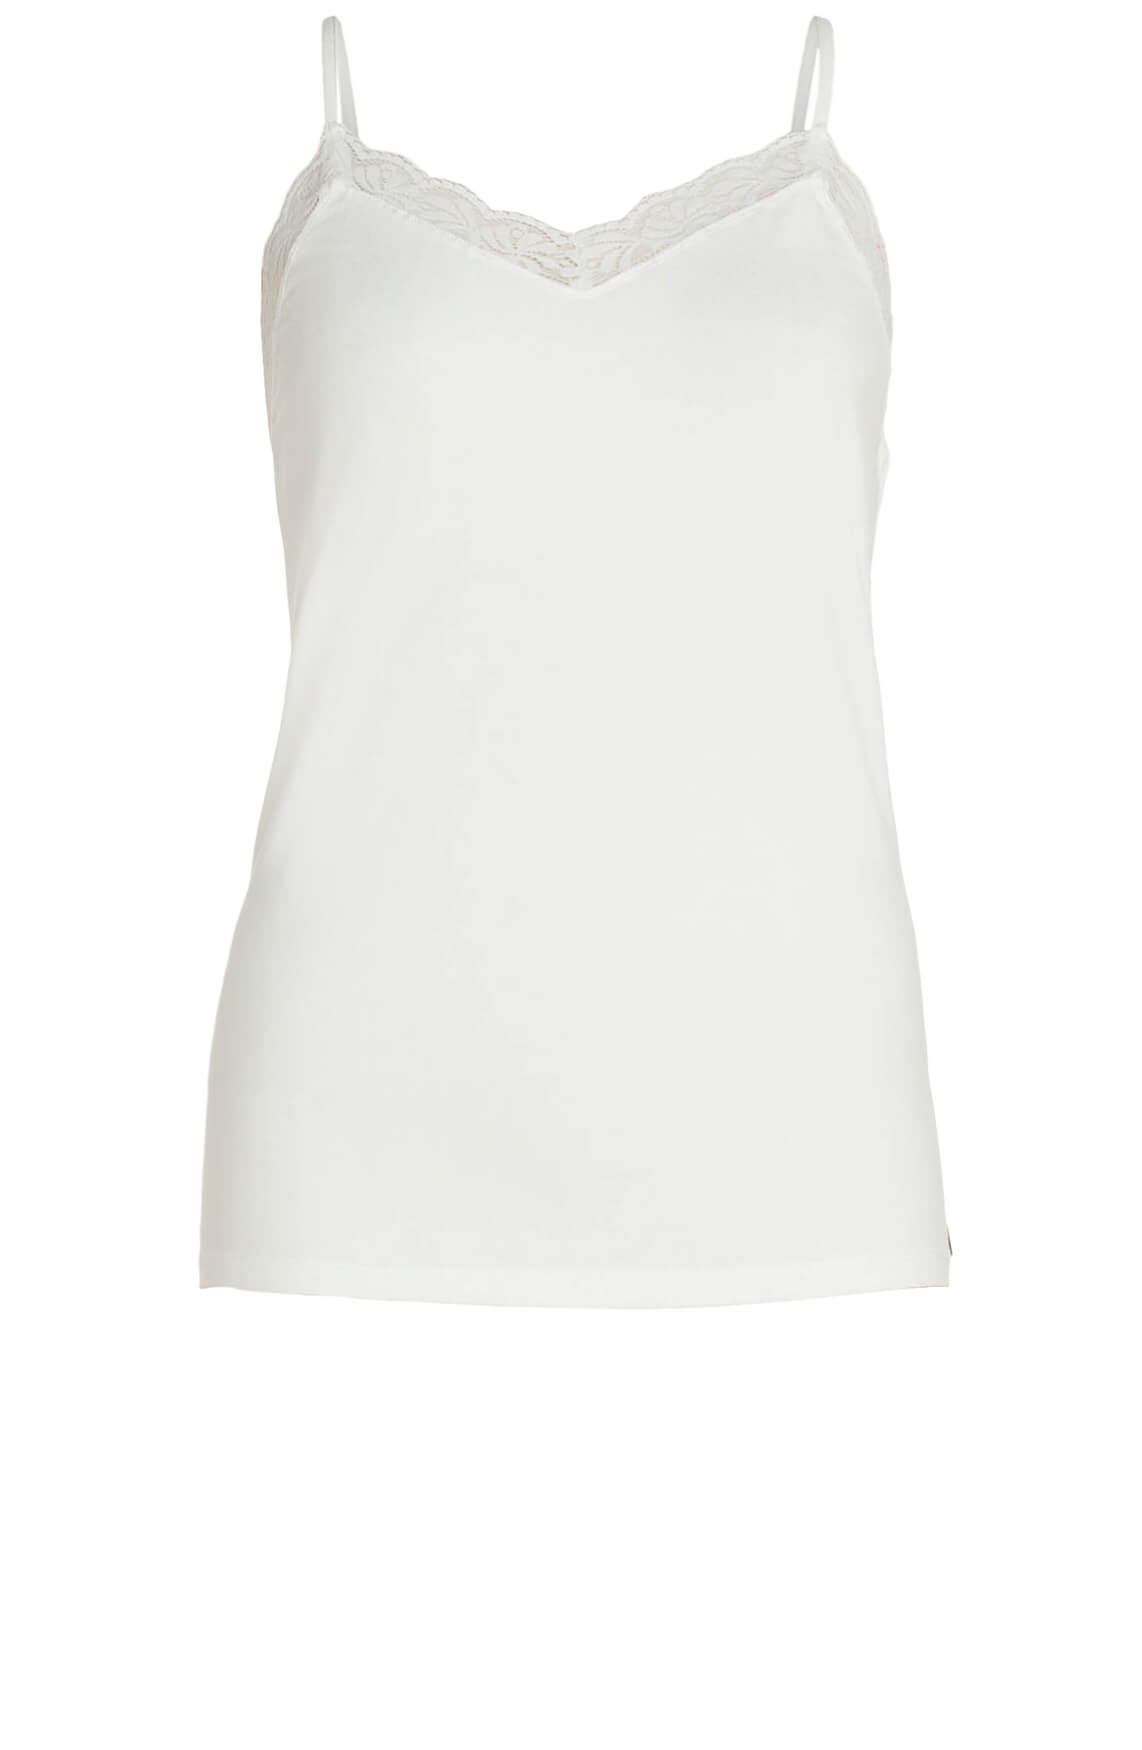 Anna Dames Top met kant wit